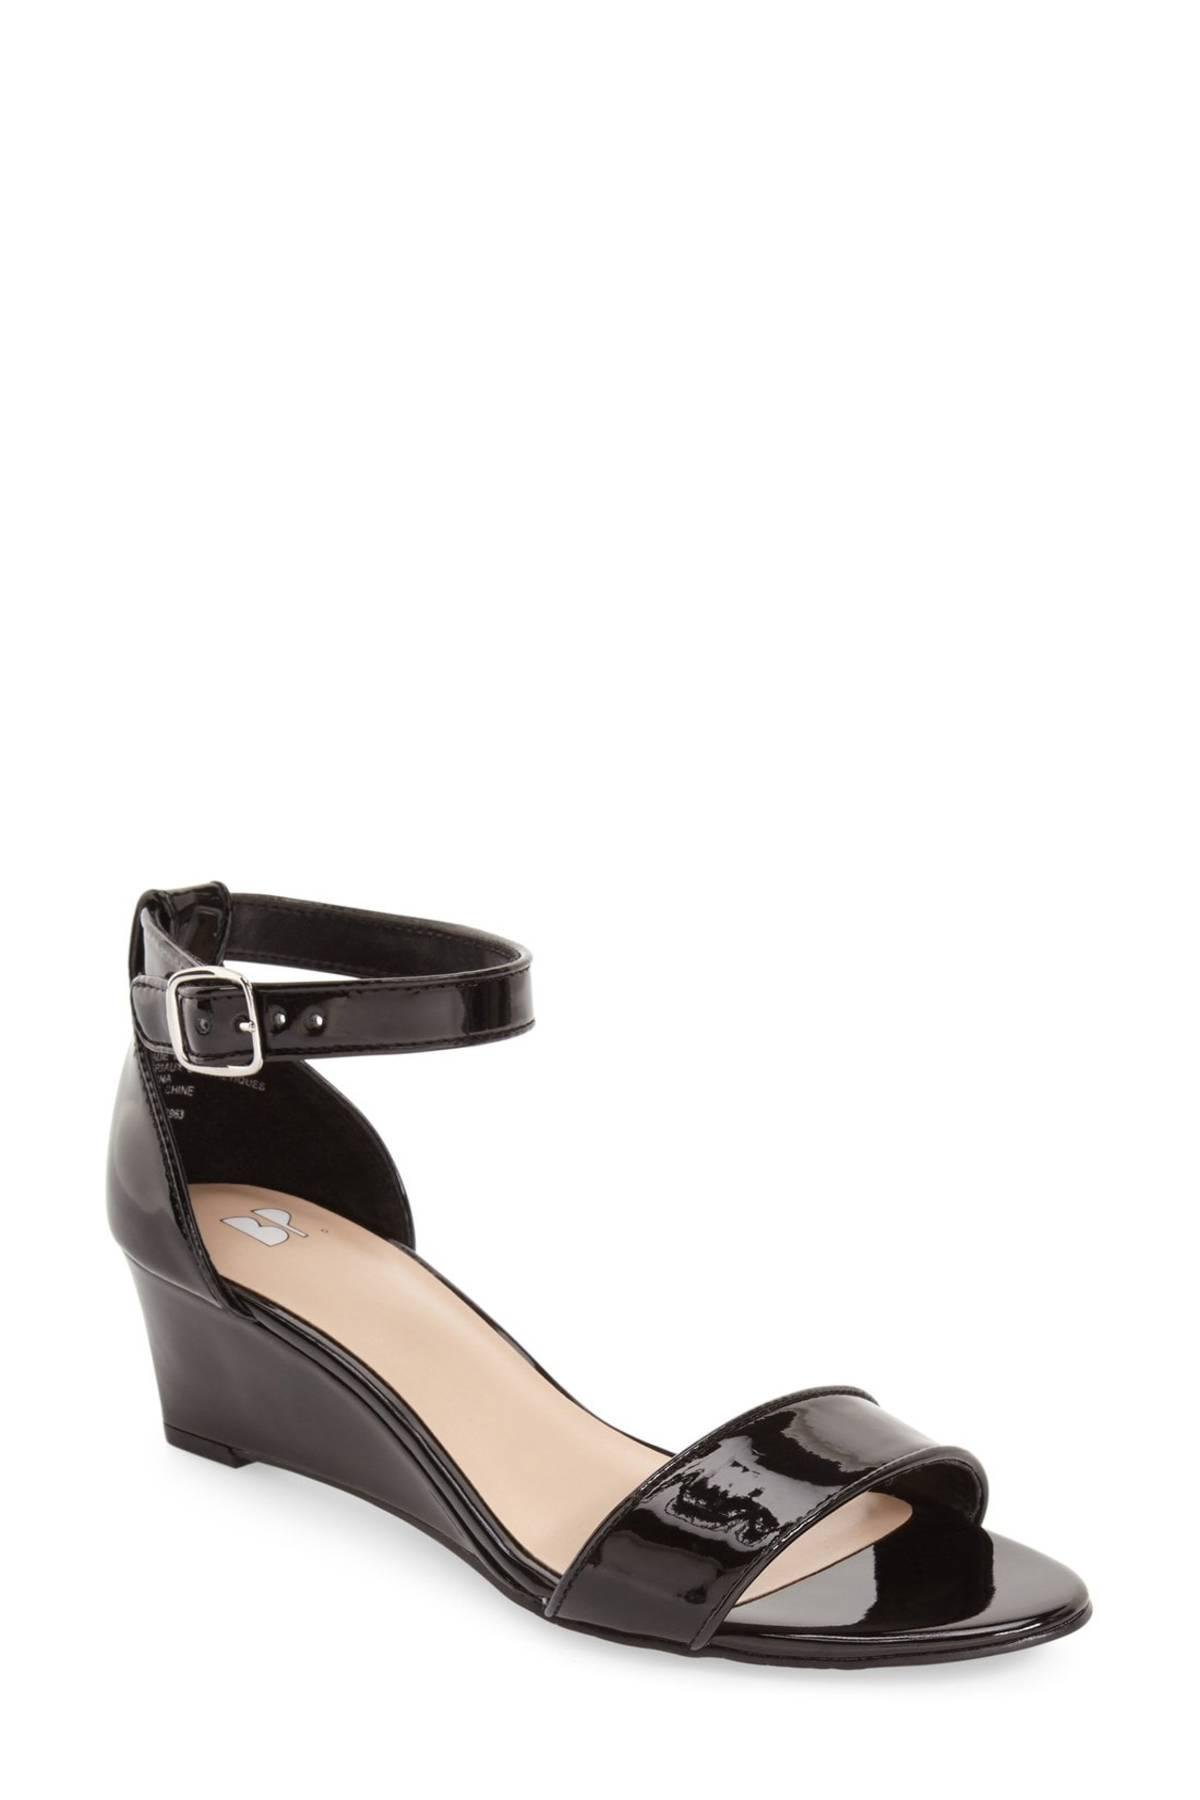 99f458538e5 Lyst - BP.  roxie  Wedge Sandal (women) in Black - Save ...